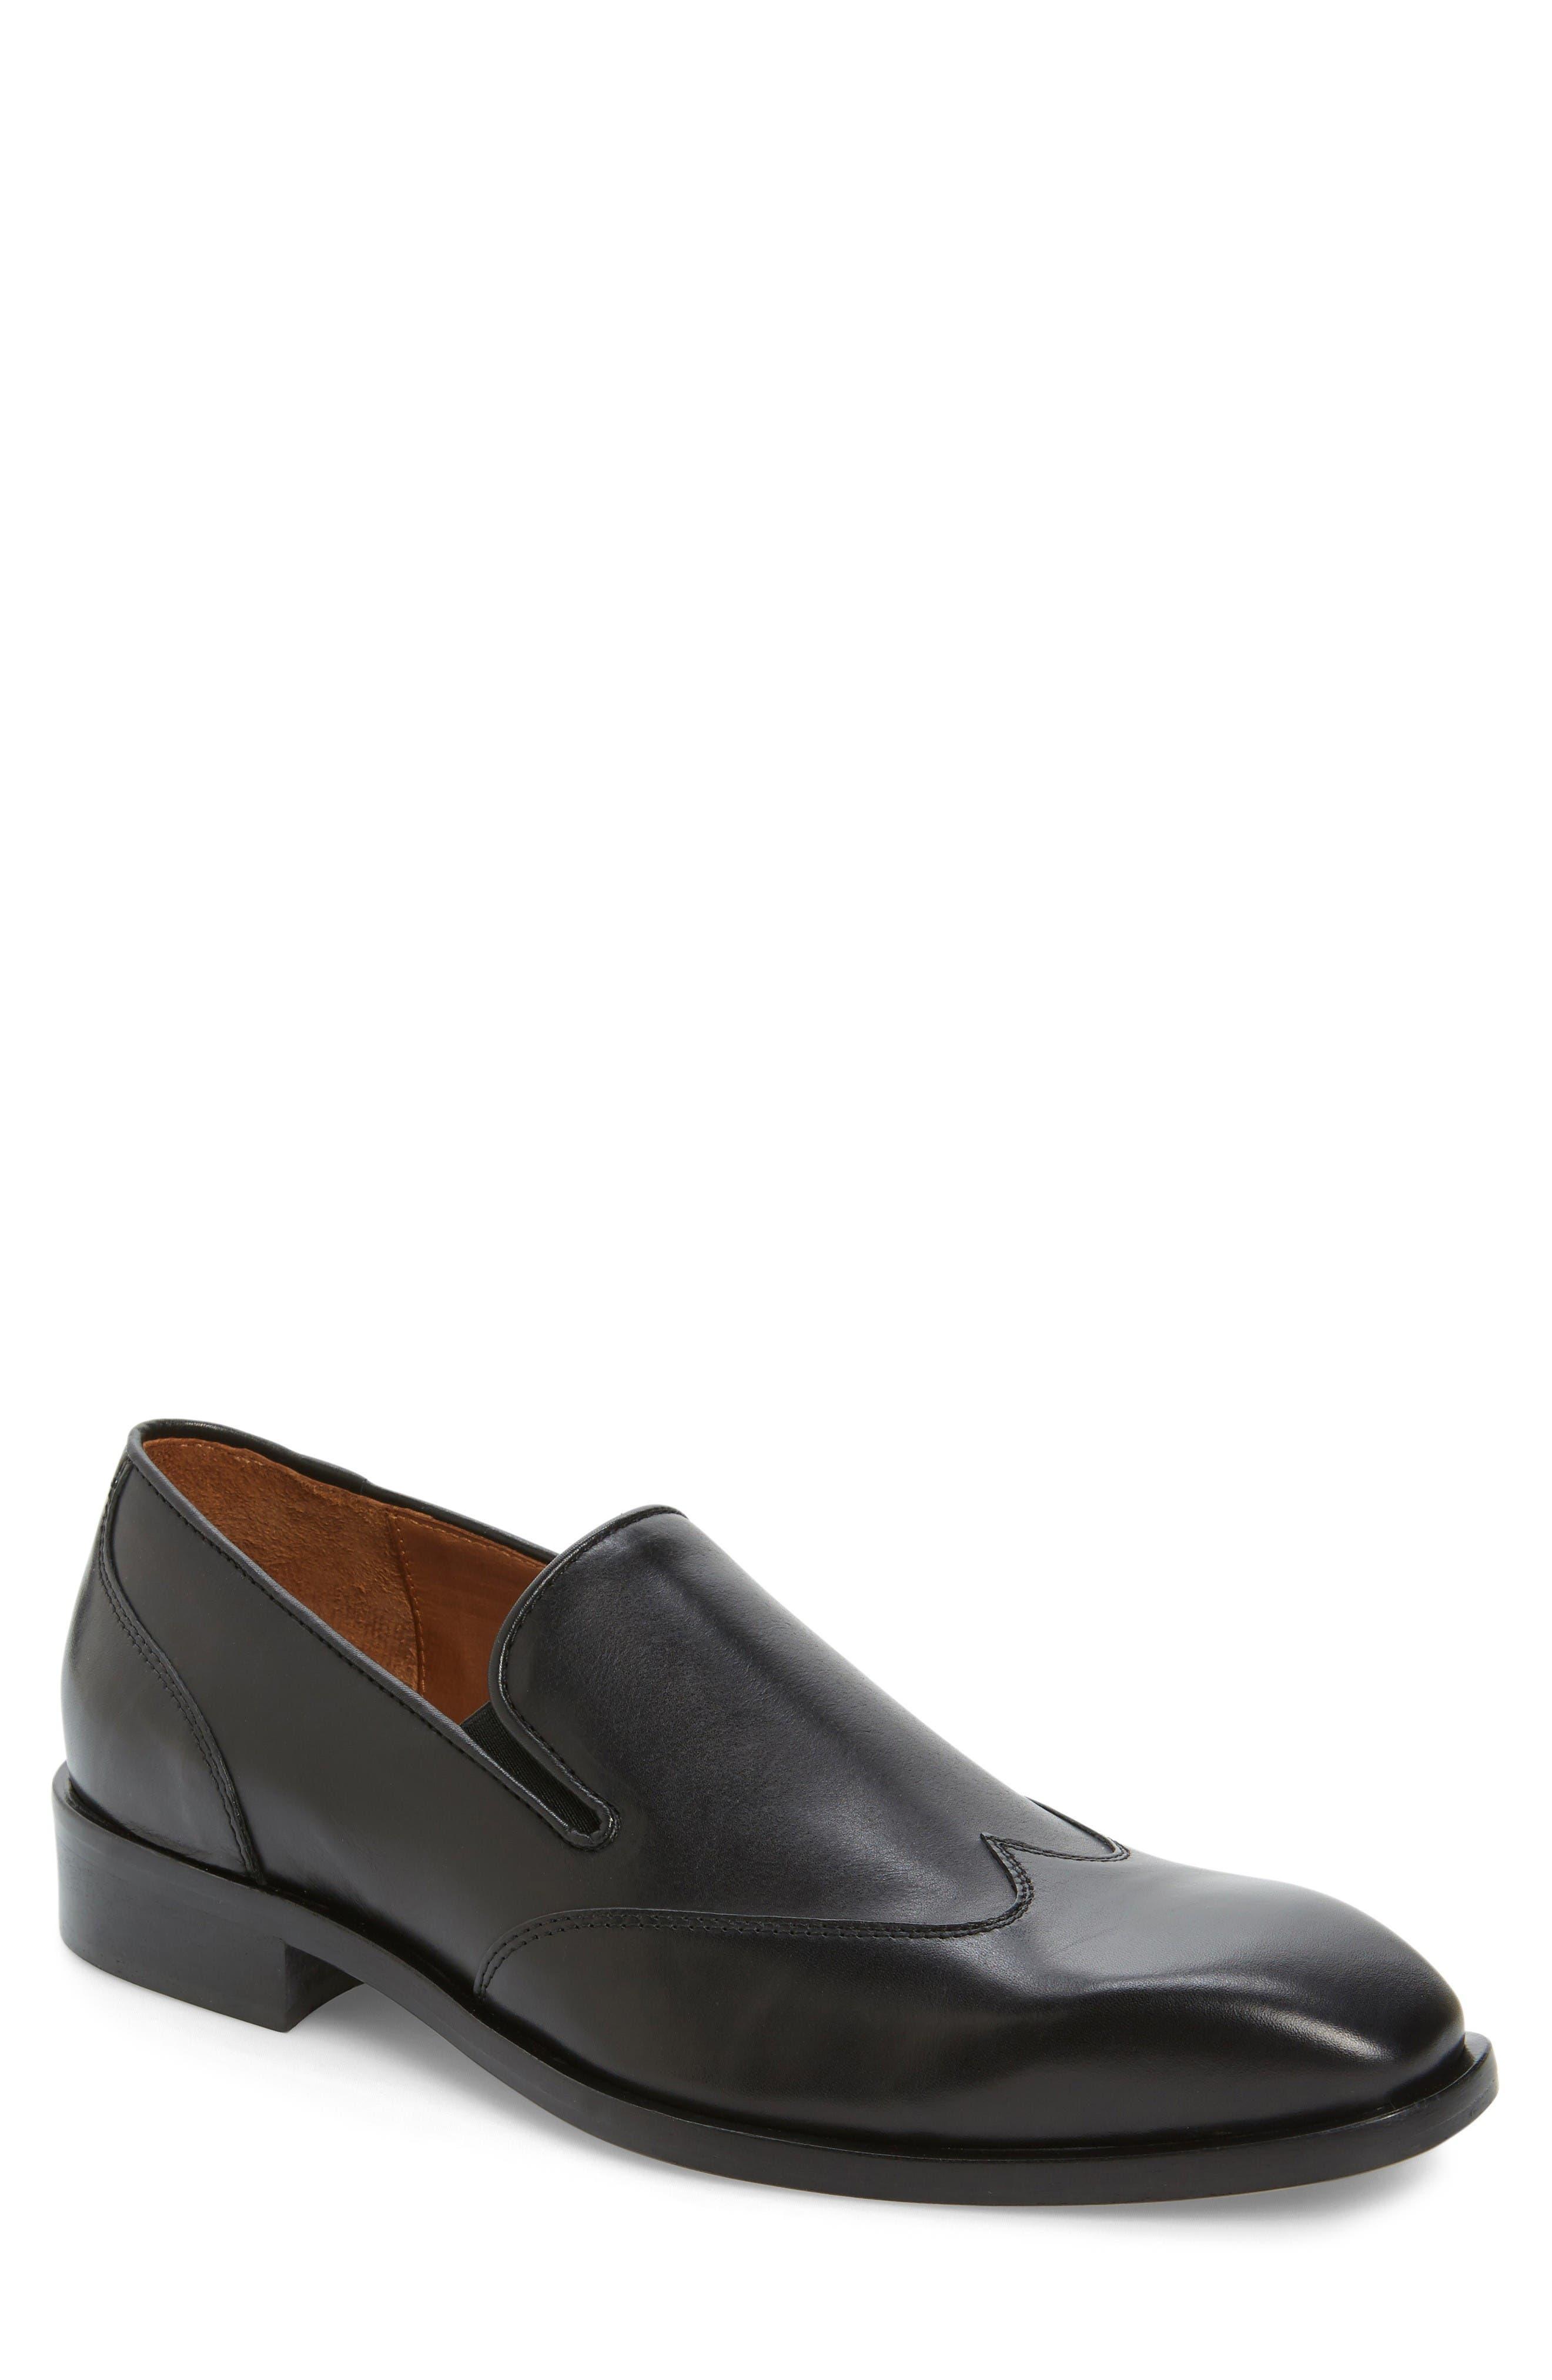 Valente Venetian Loafer,                         Main,                         color, Black Leather